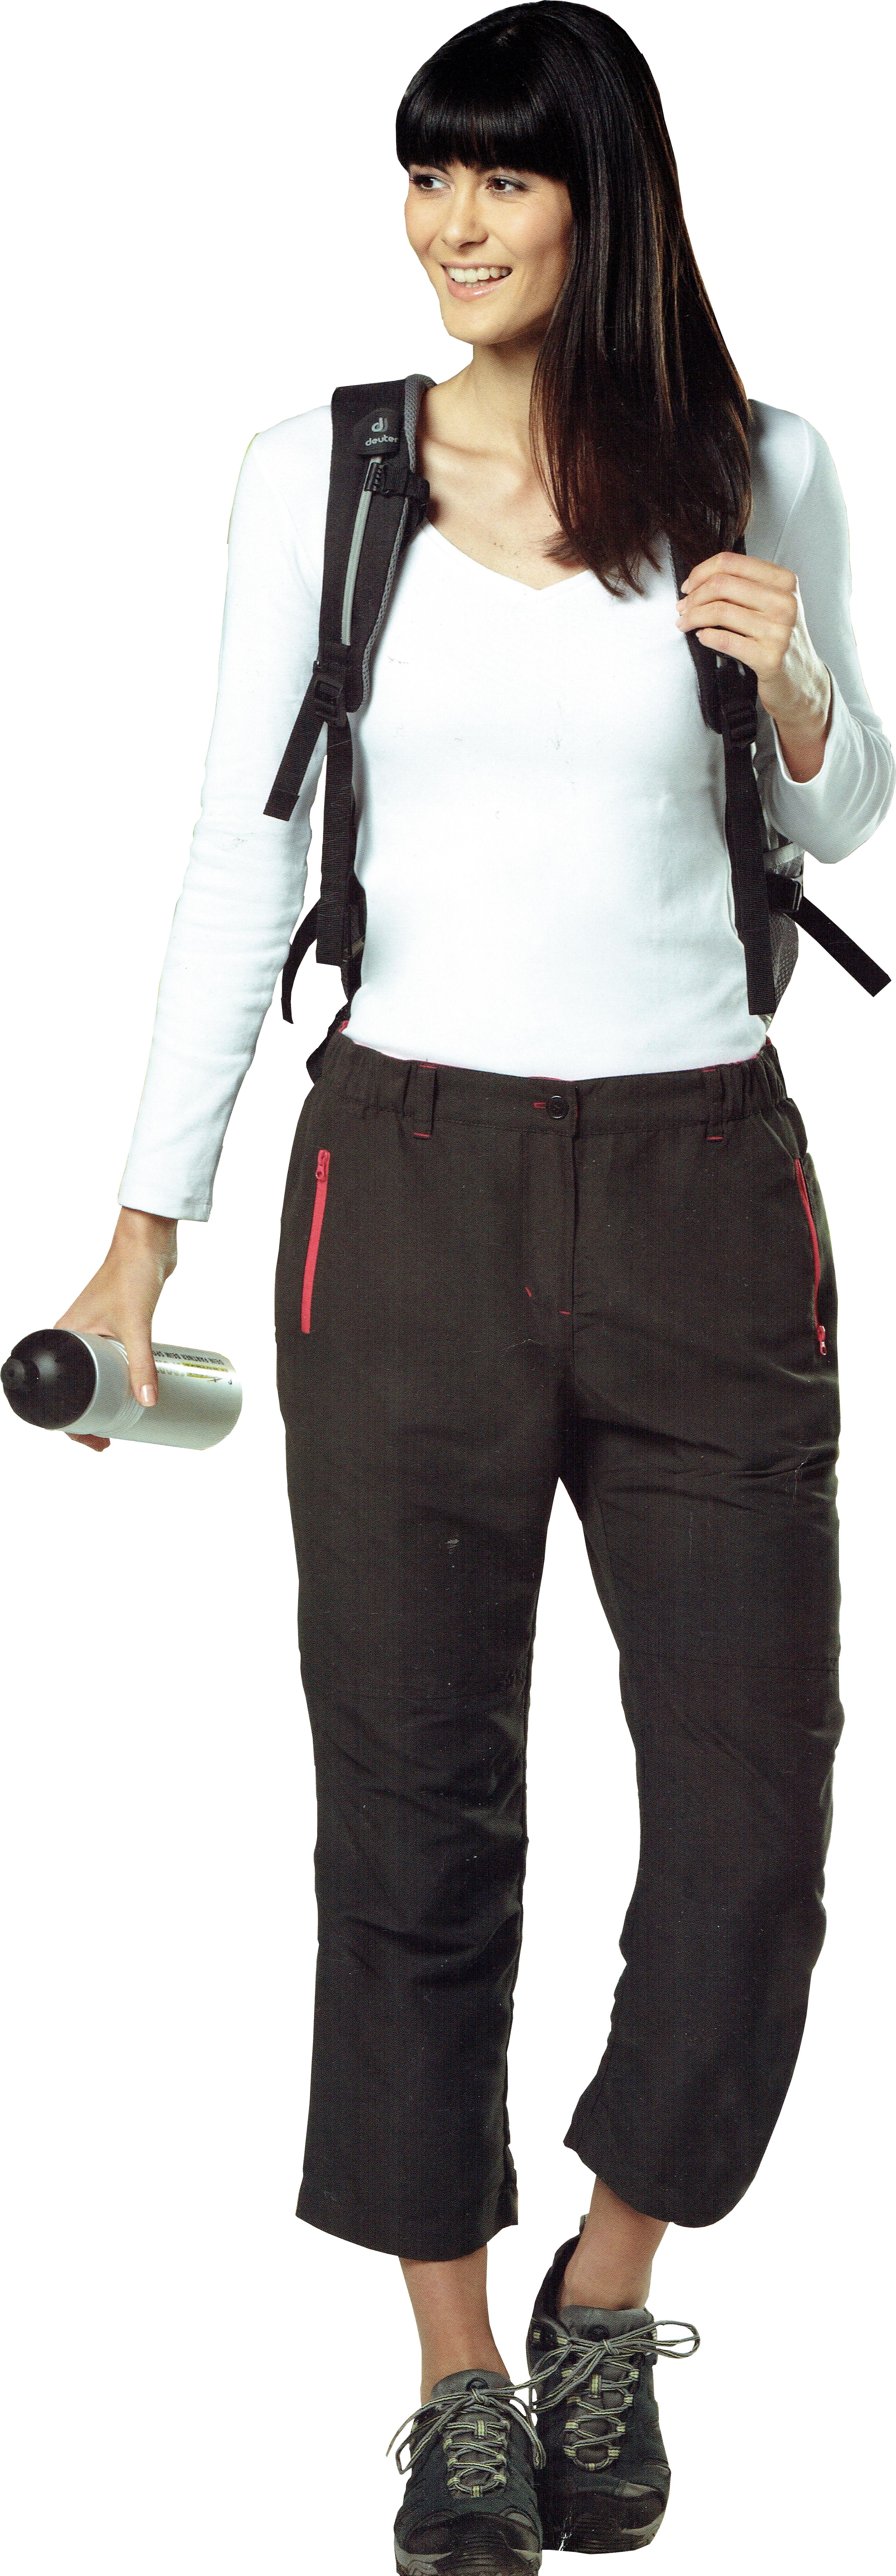 Wanderhose-Outdoorhose-Trekkinghose-Tourenbekleidung-Abzipphose-Zipp-Off-2-in-1 Indexbild 3